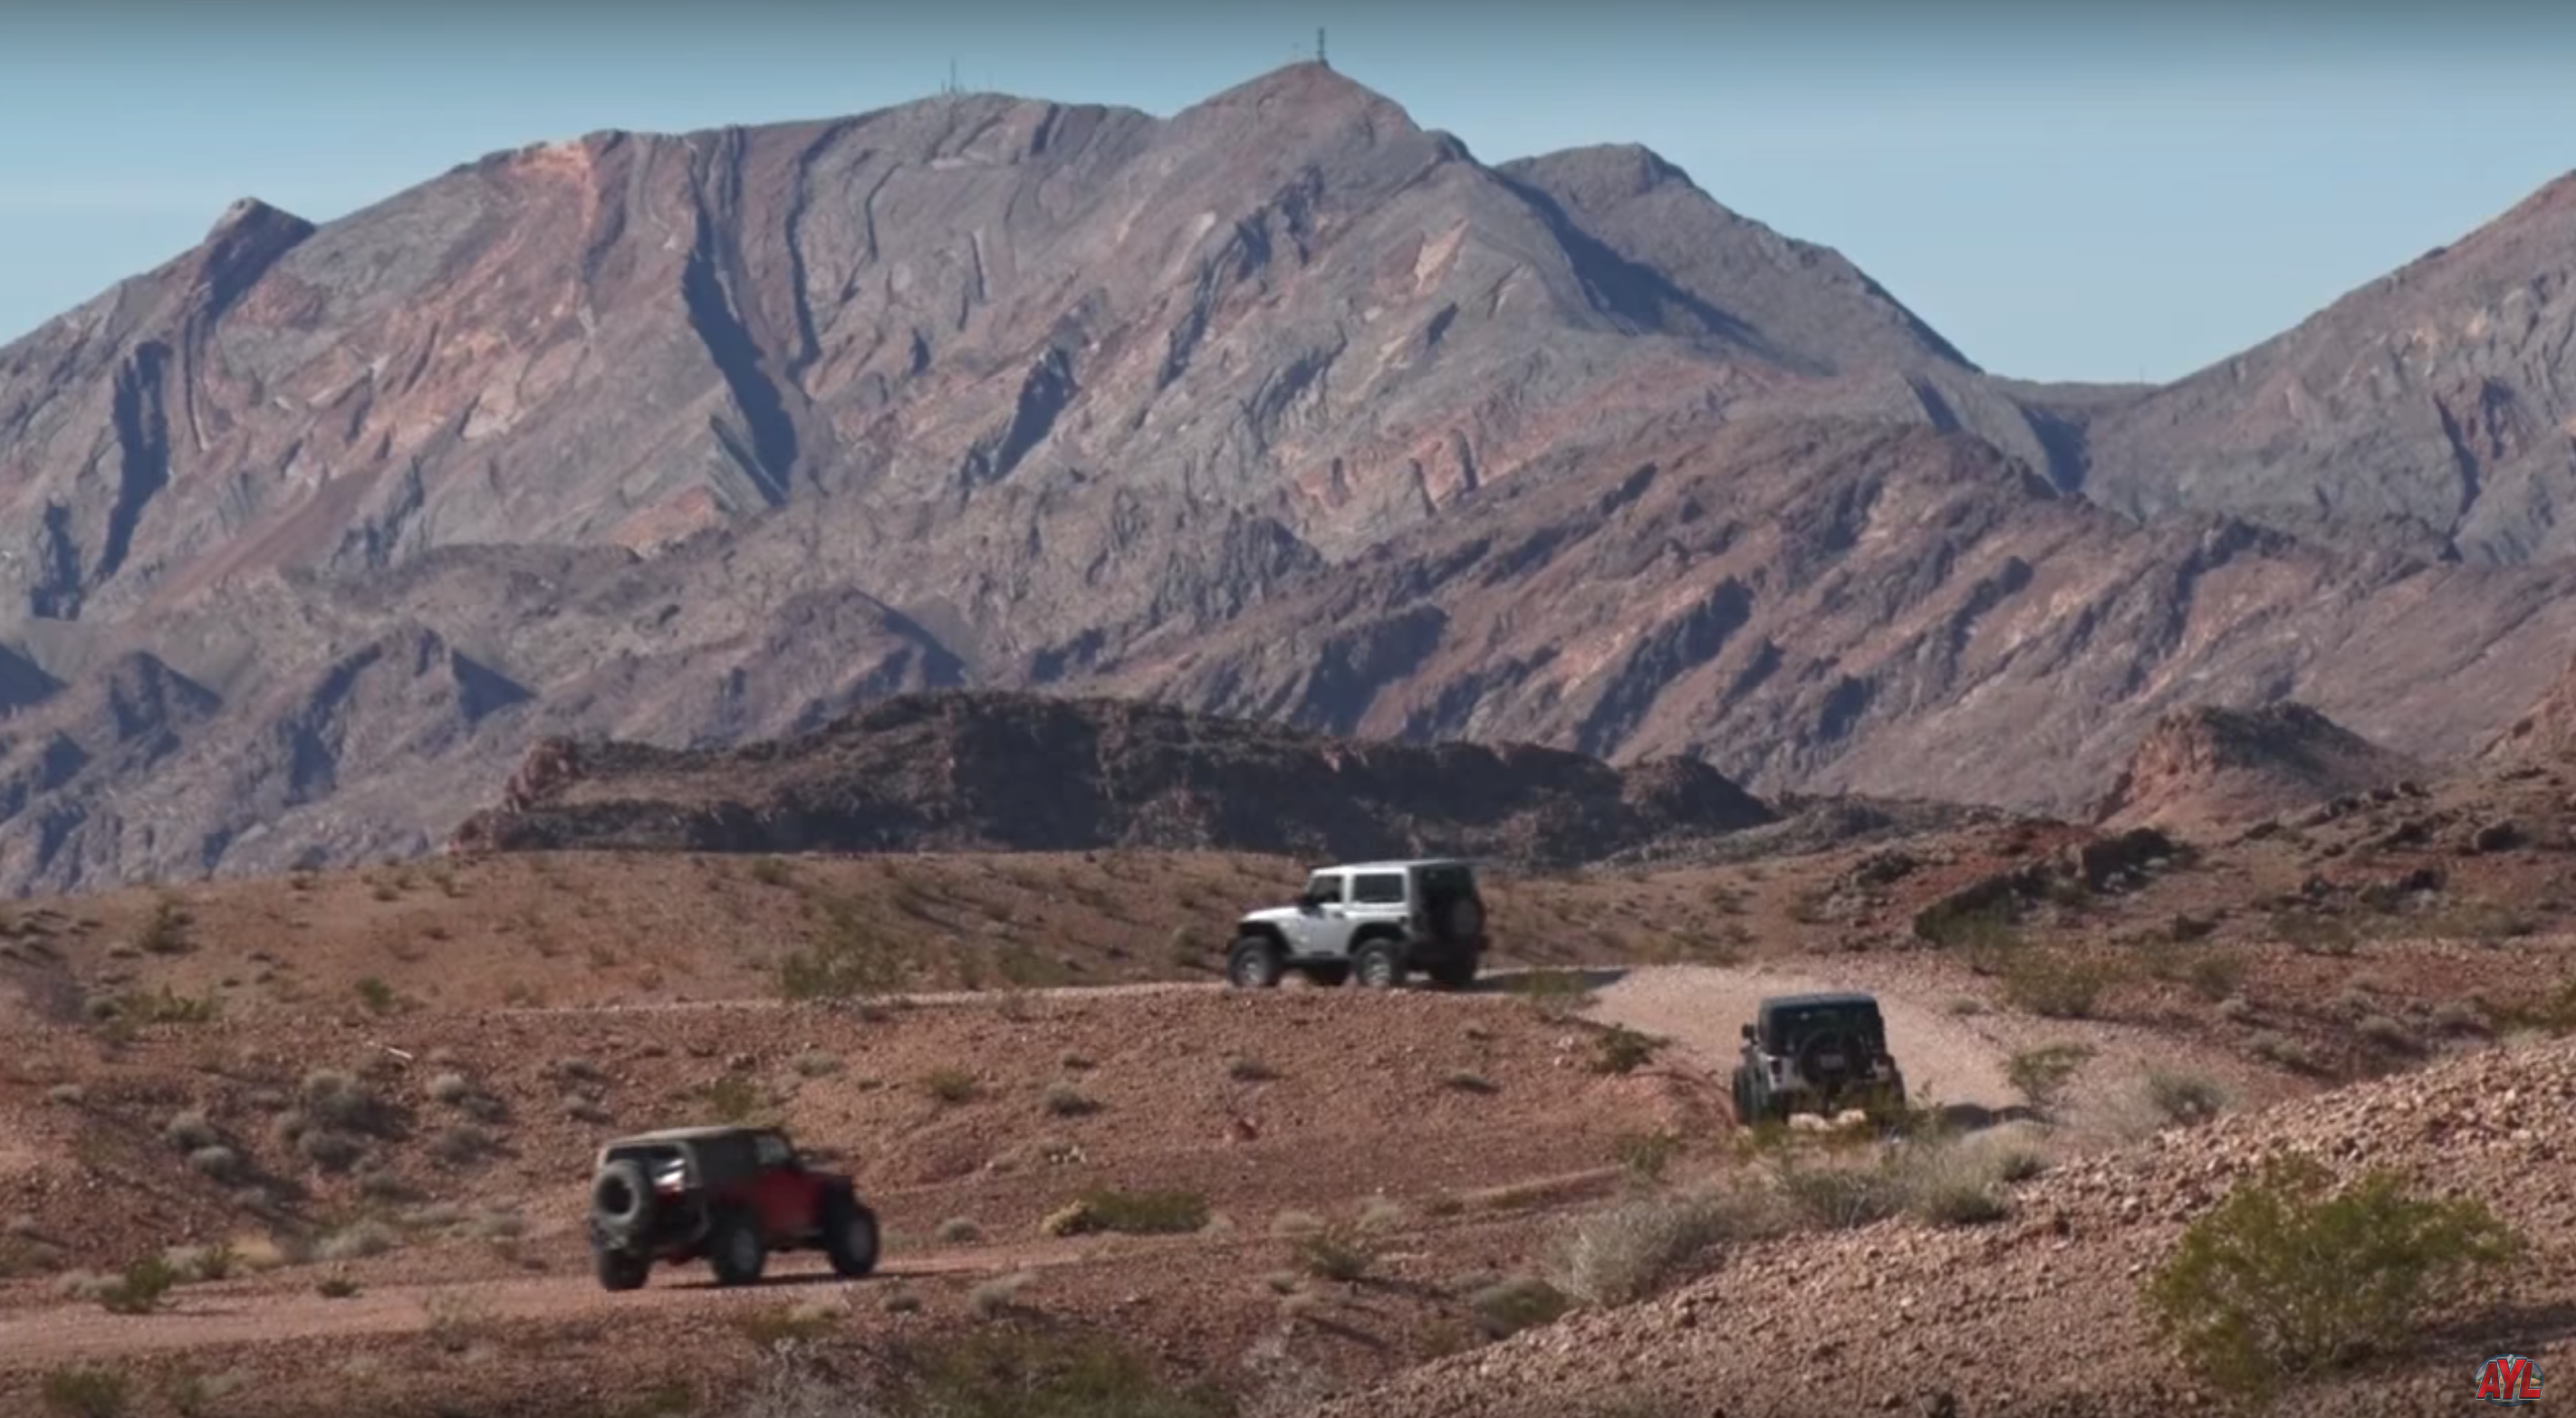 Nevada Desert – Mount Pleasant – South Africa